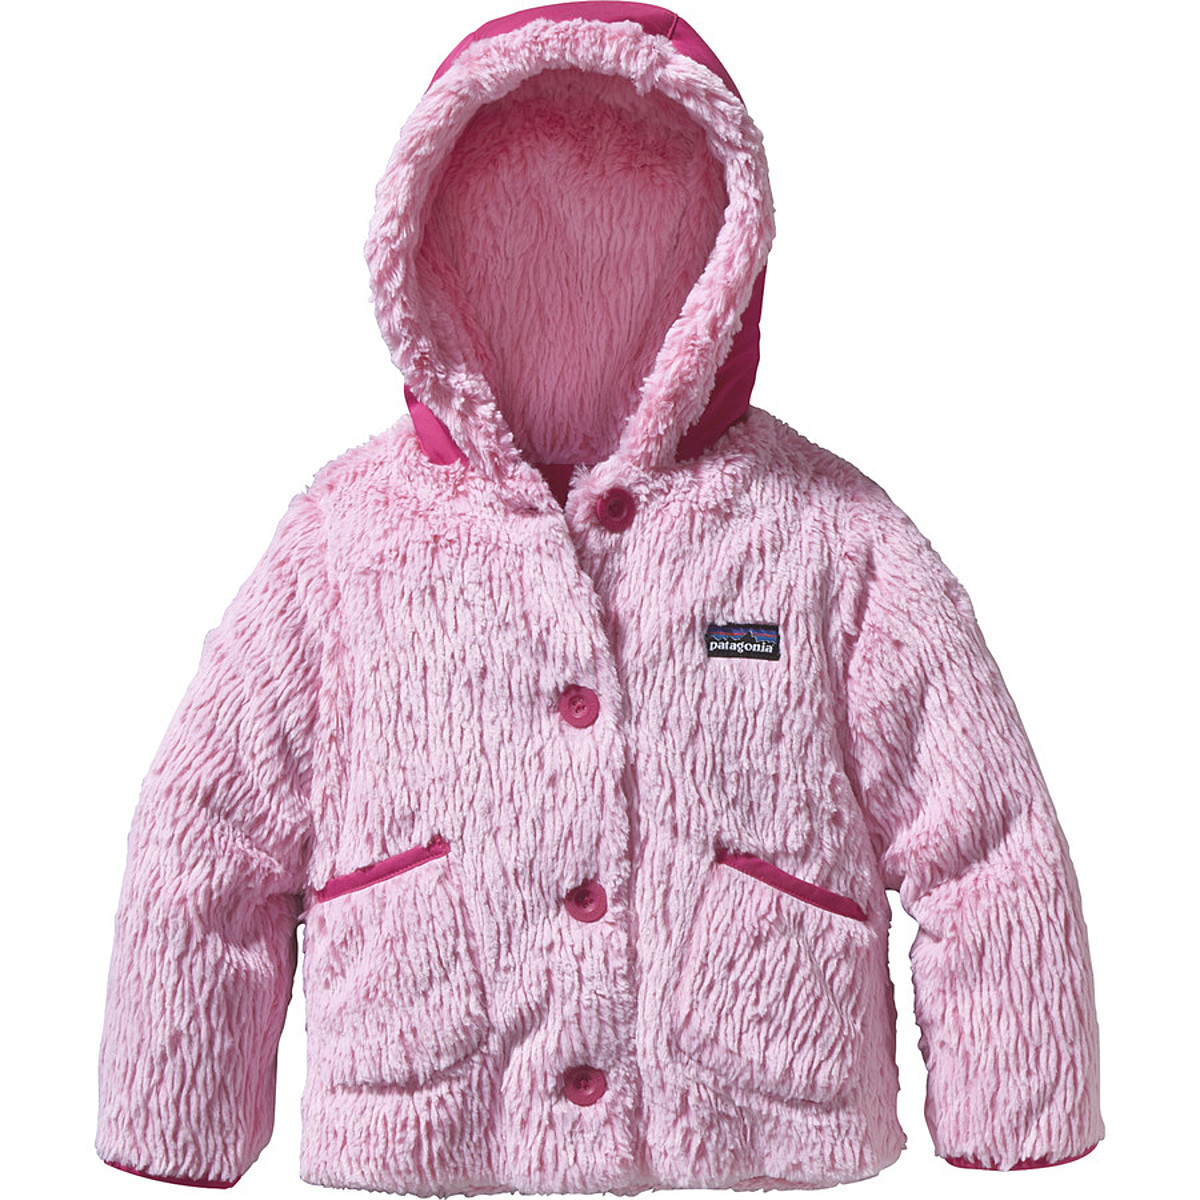 Patagonia Conejito Jacket